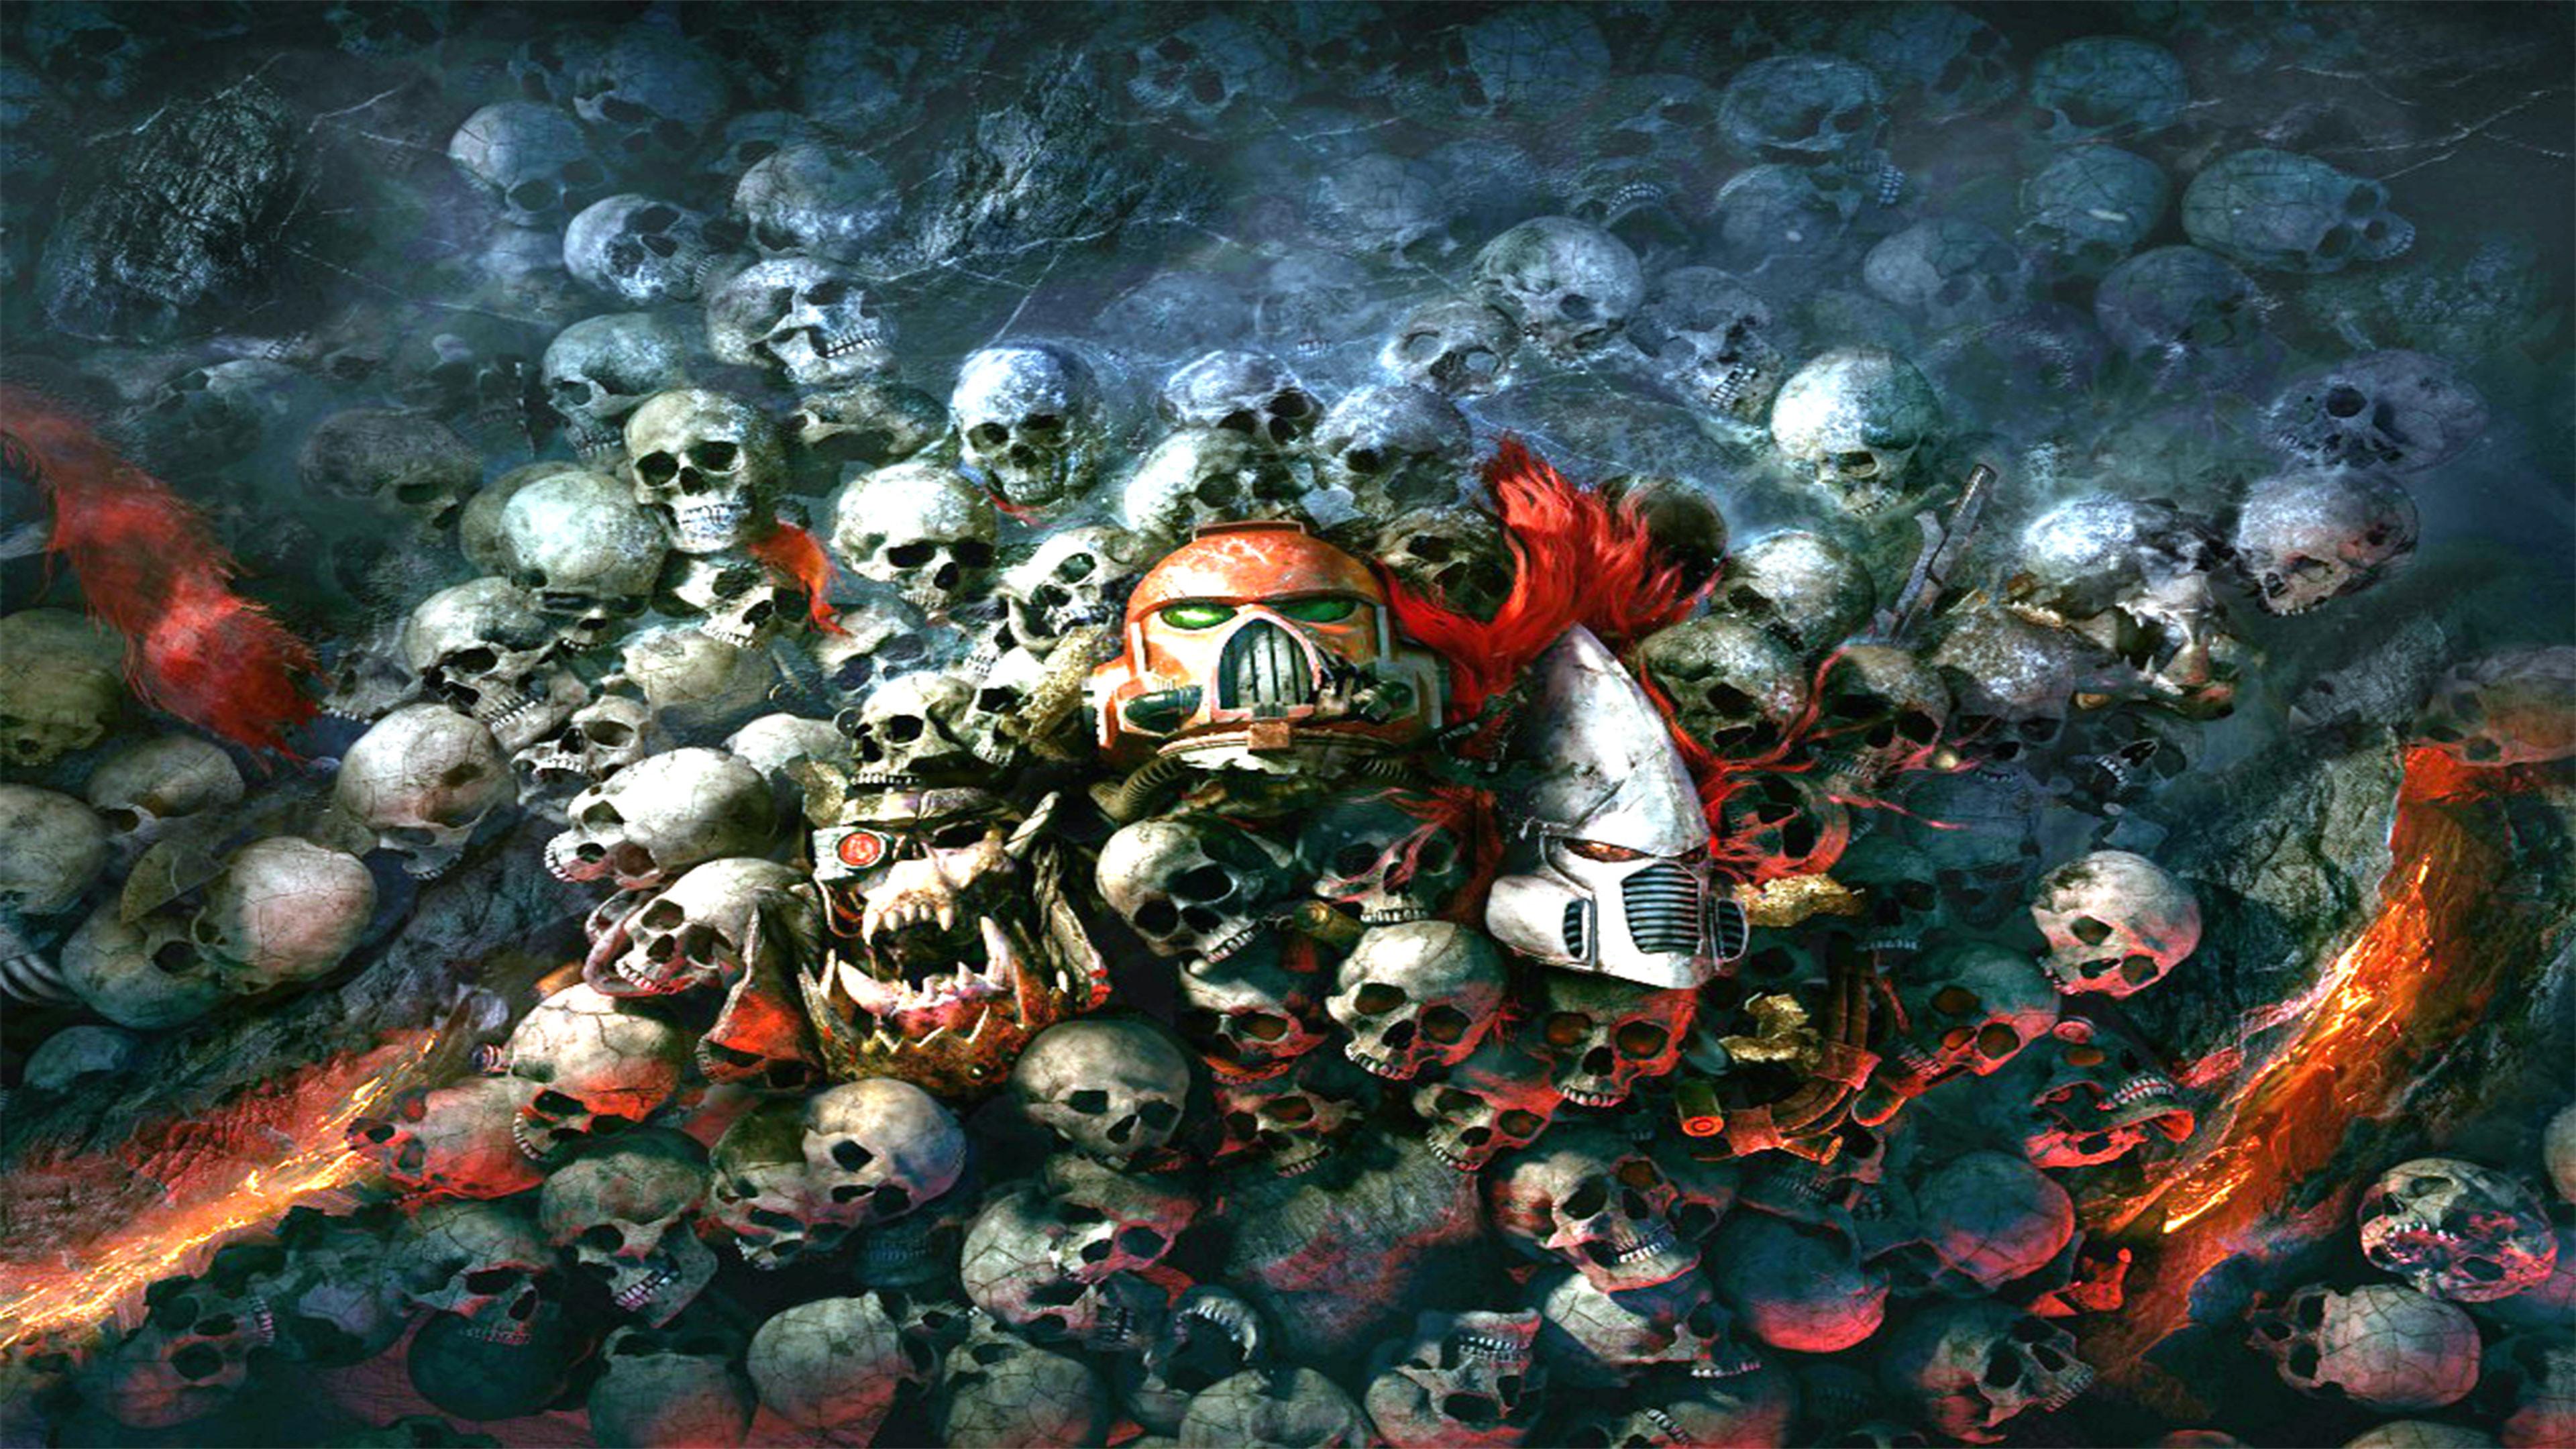 Warhammer 40k hd wallpapers